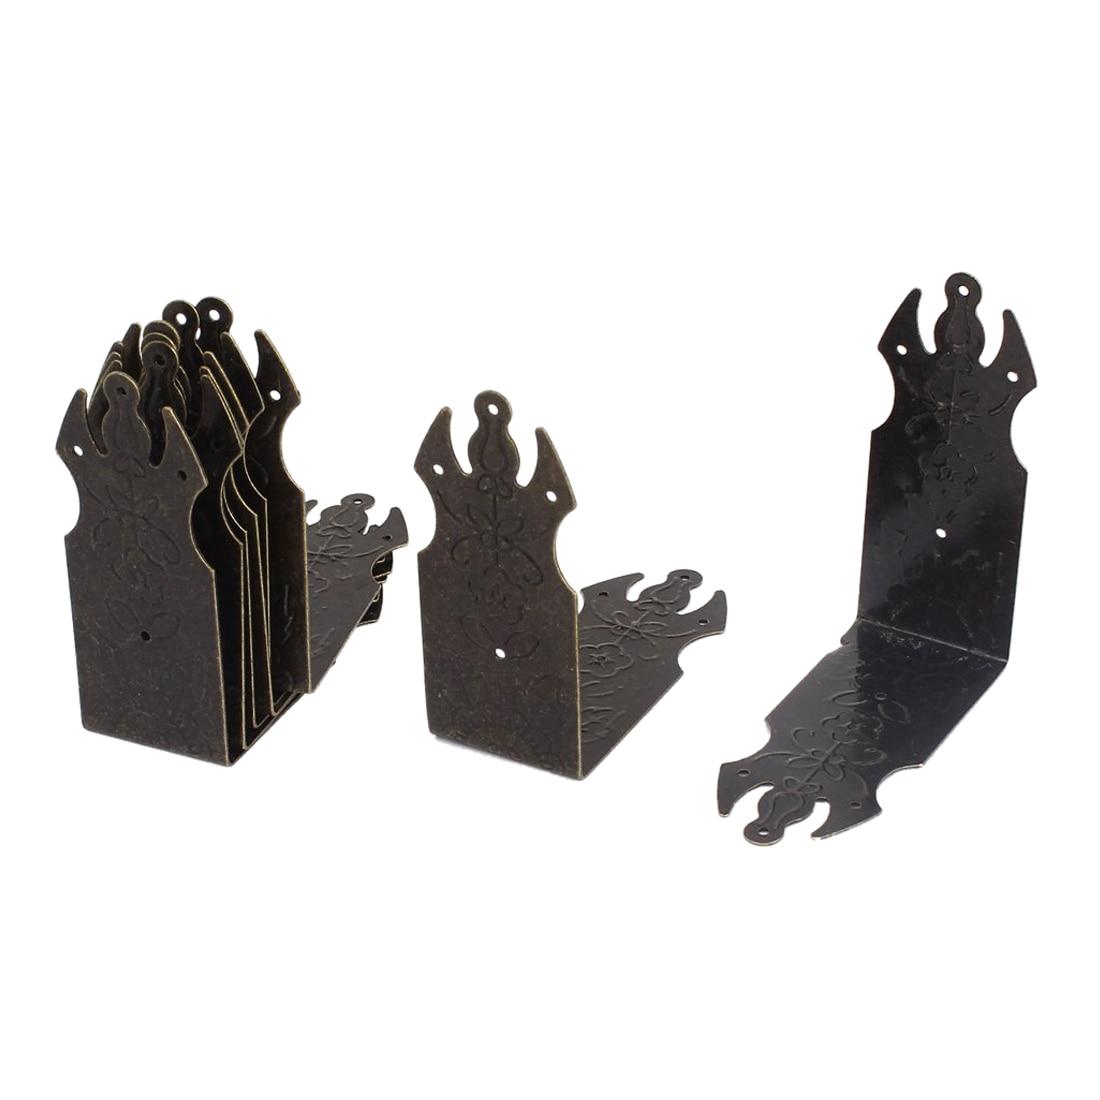 Chest Box Corners Decor Angle Plates Brace Protectors 70x70mm 8pcs keller charles melamine appetizer plates box of 6